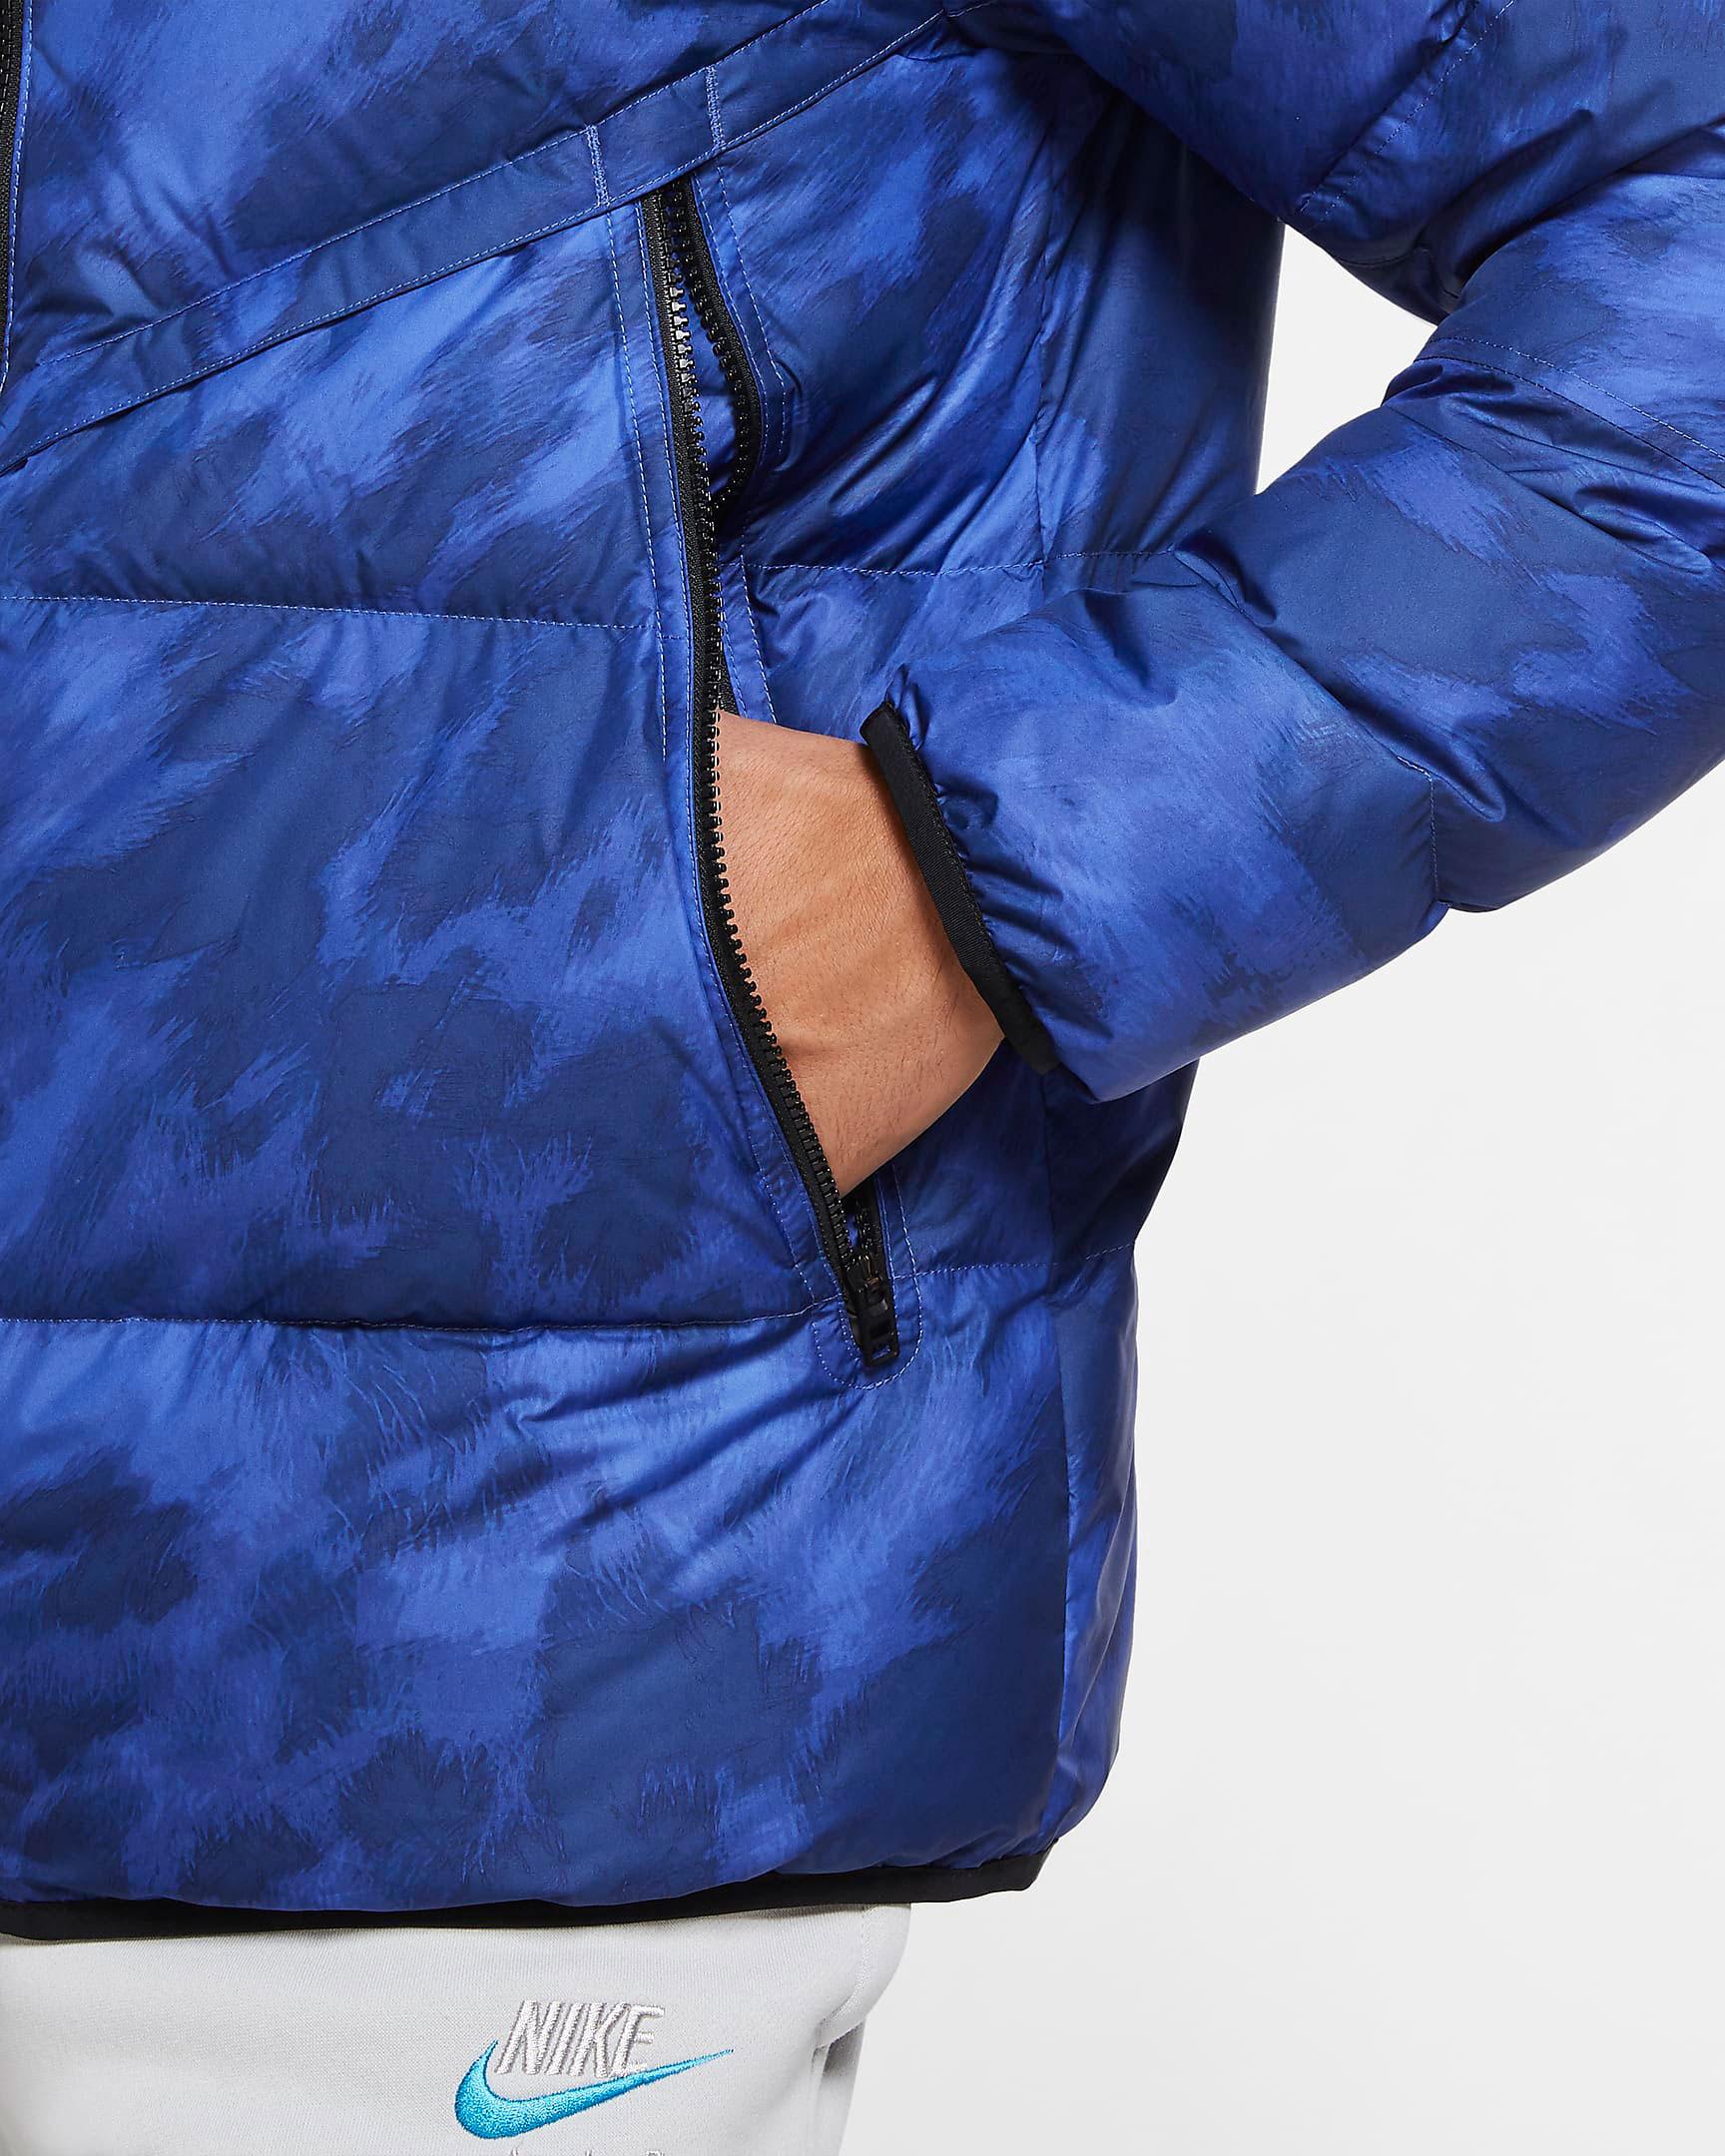 jordan-13-hyper-royal-black-nike-winter-jacket-5